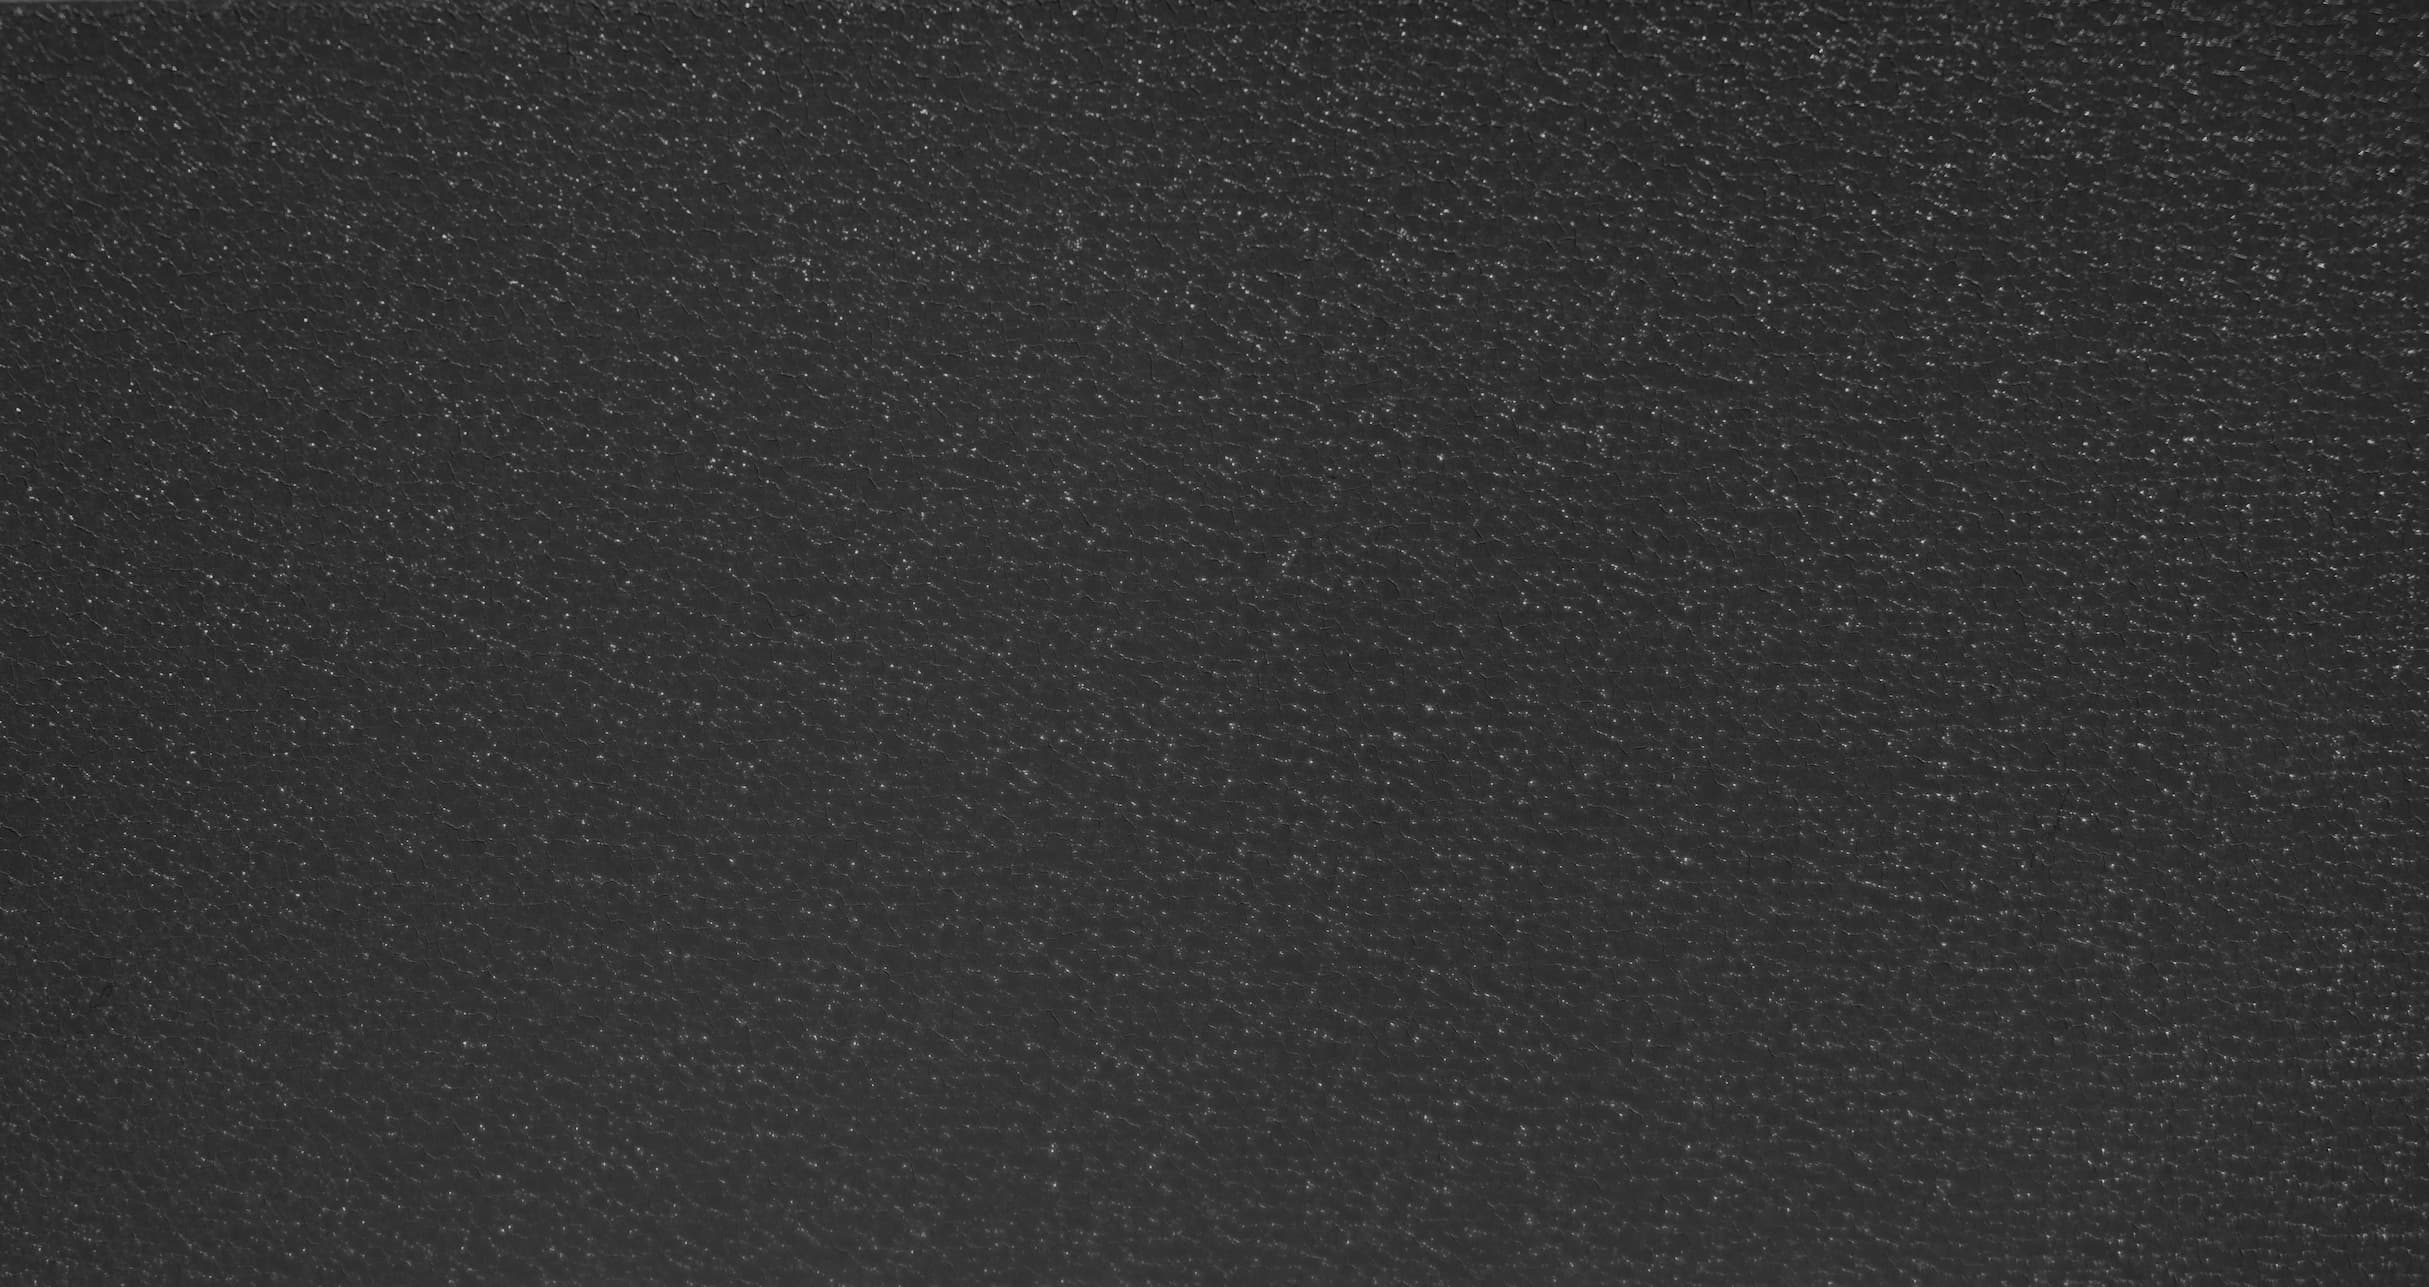 Textured space grey